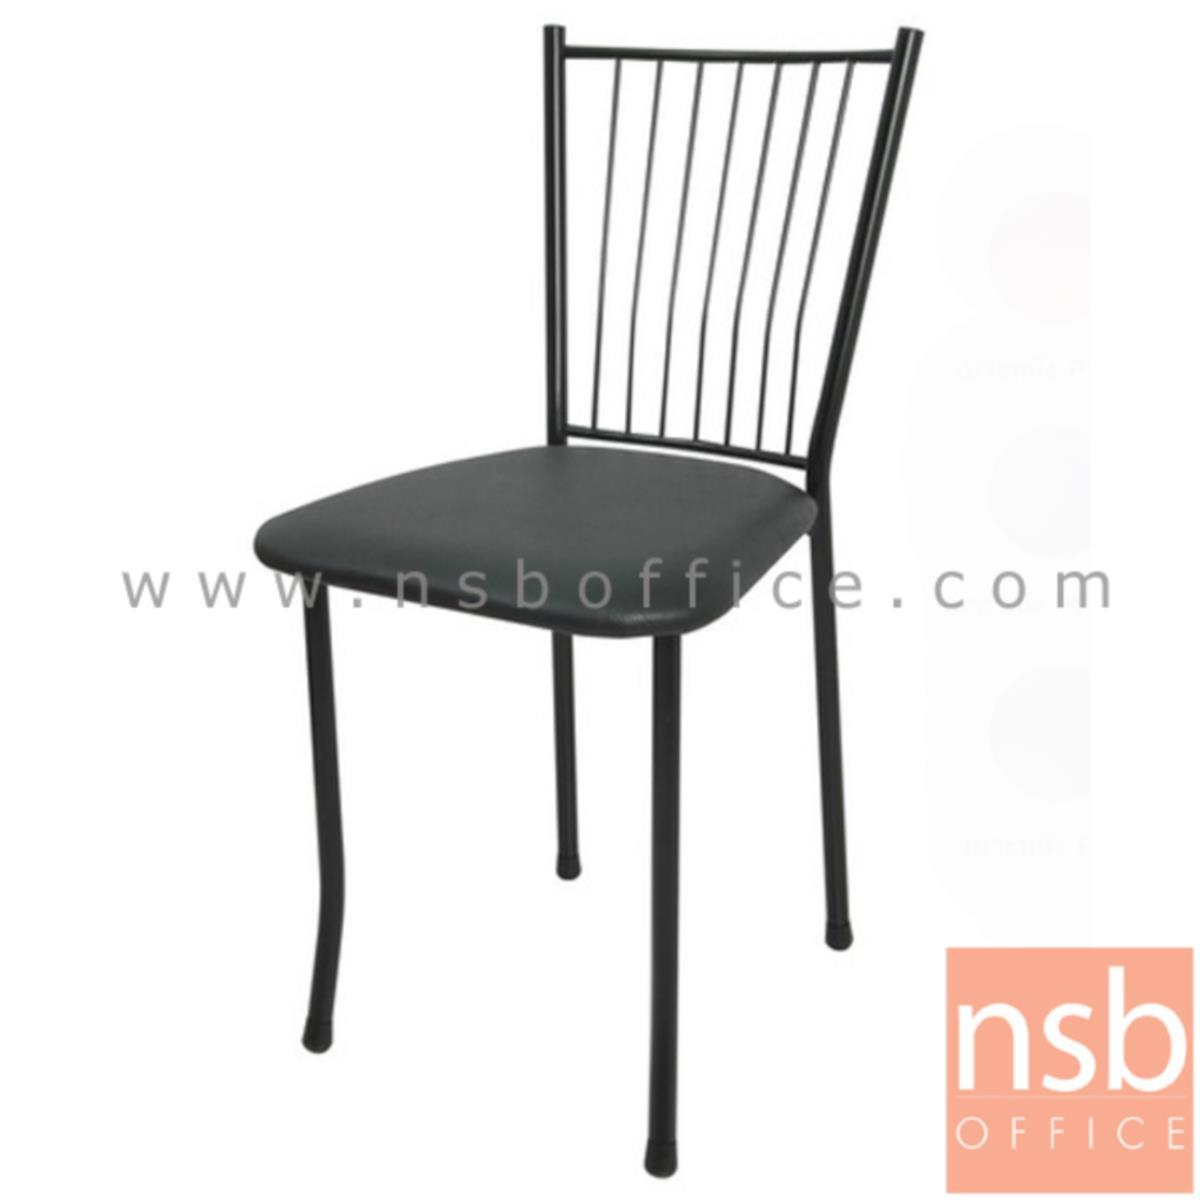 B20A049:เก้าอี้อเนกประสงค์เหล็ก รุ่น SOFIA-BB  ขาเหล็กพ่นดำ